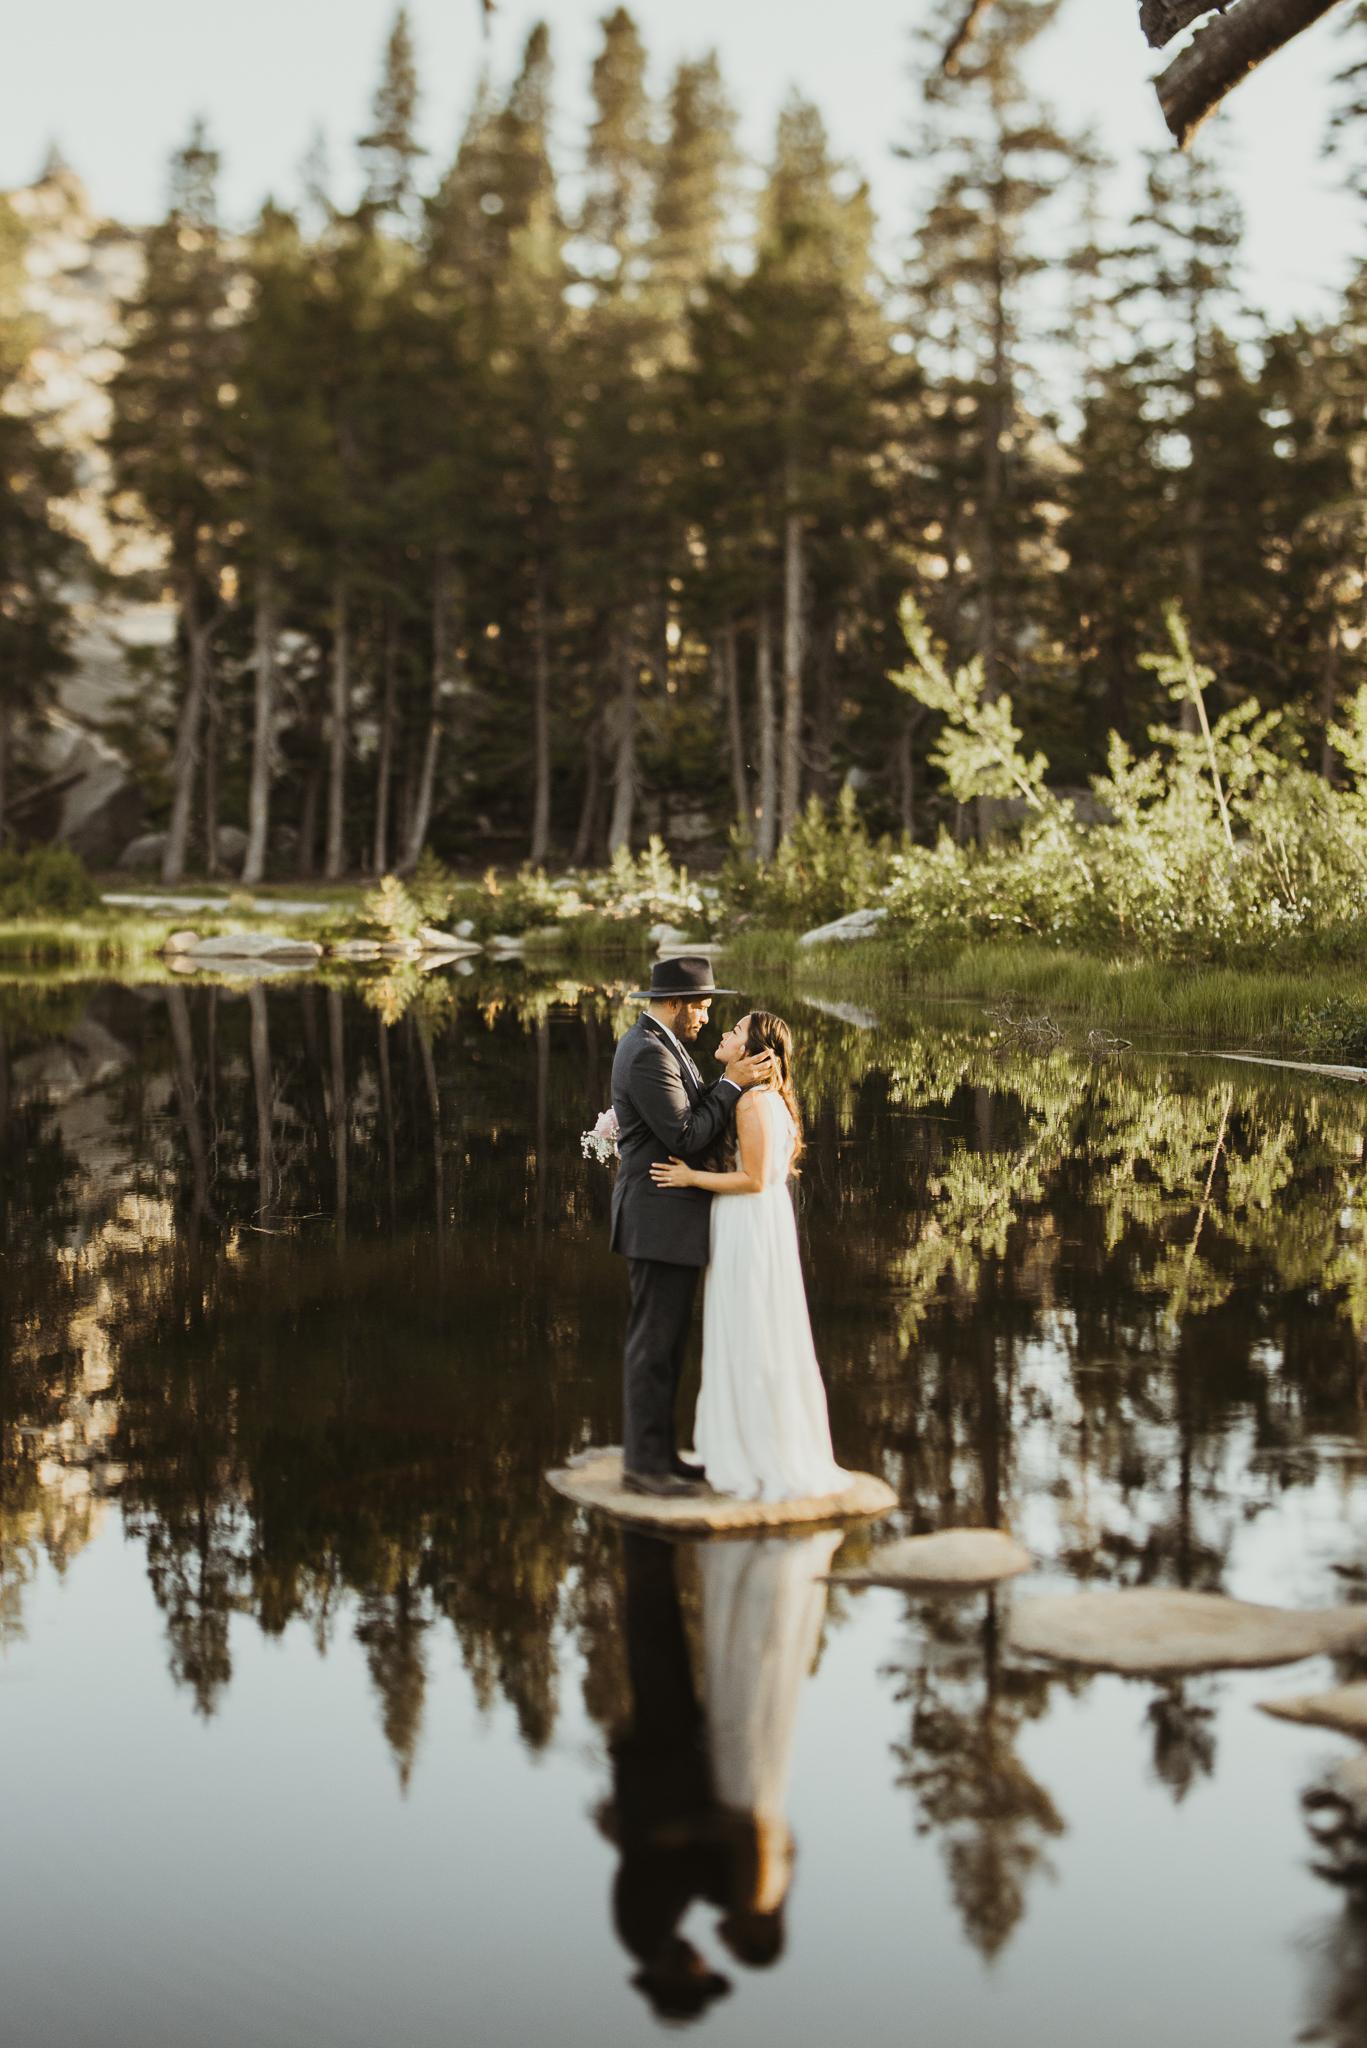 ©Isaiah & Taylor Photography -The Hideout Wedding, Kirkwood California, Lake Tahoe Wedding Photographer-173.jpg